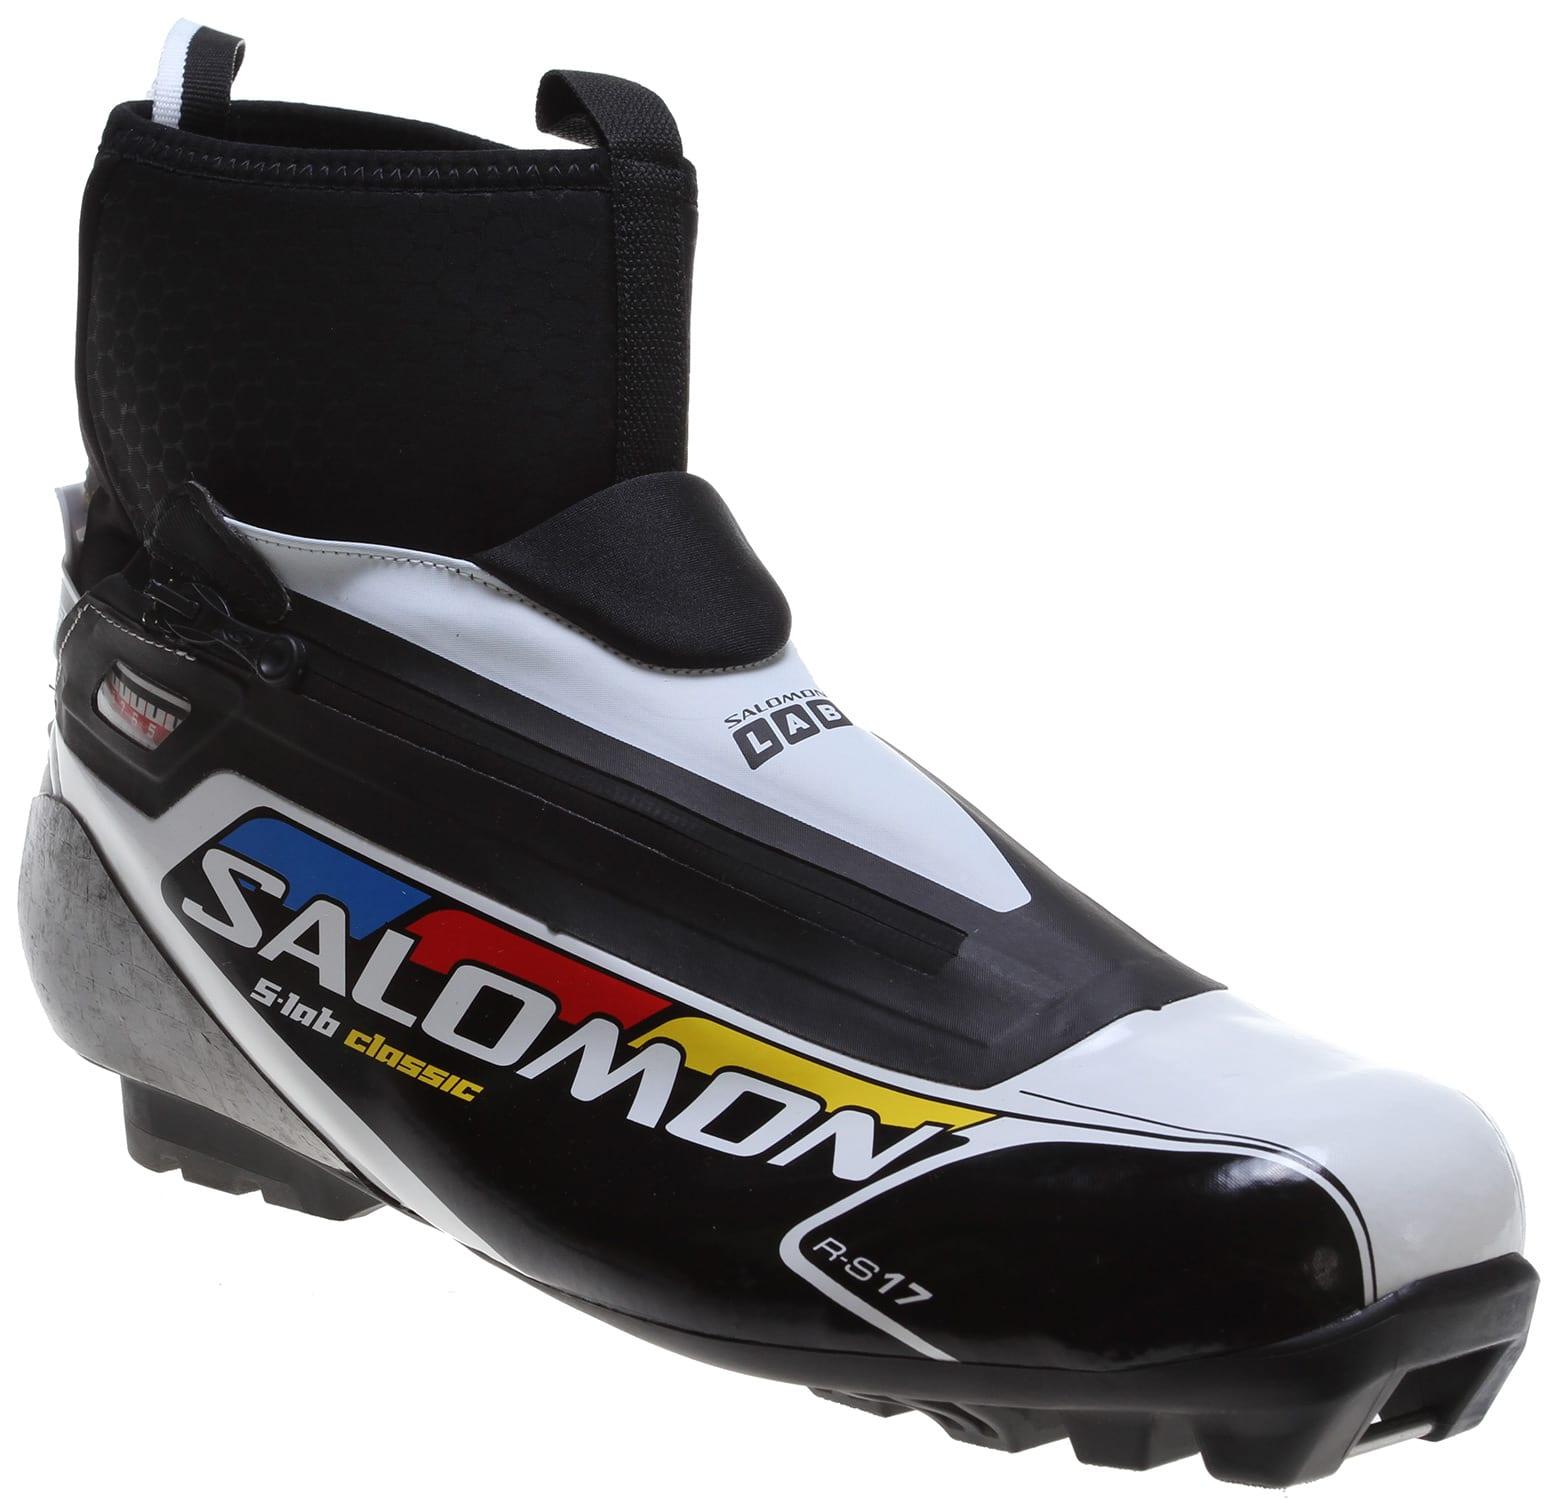 Salomon S-Lab Classic XC Ski Boots